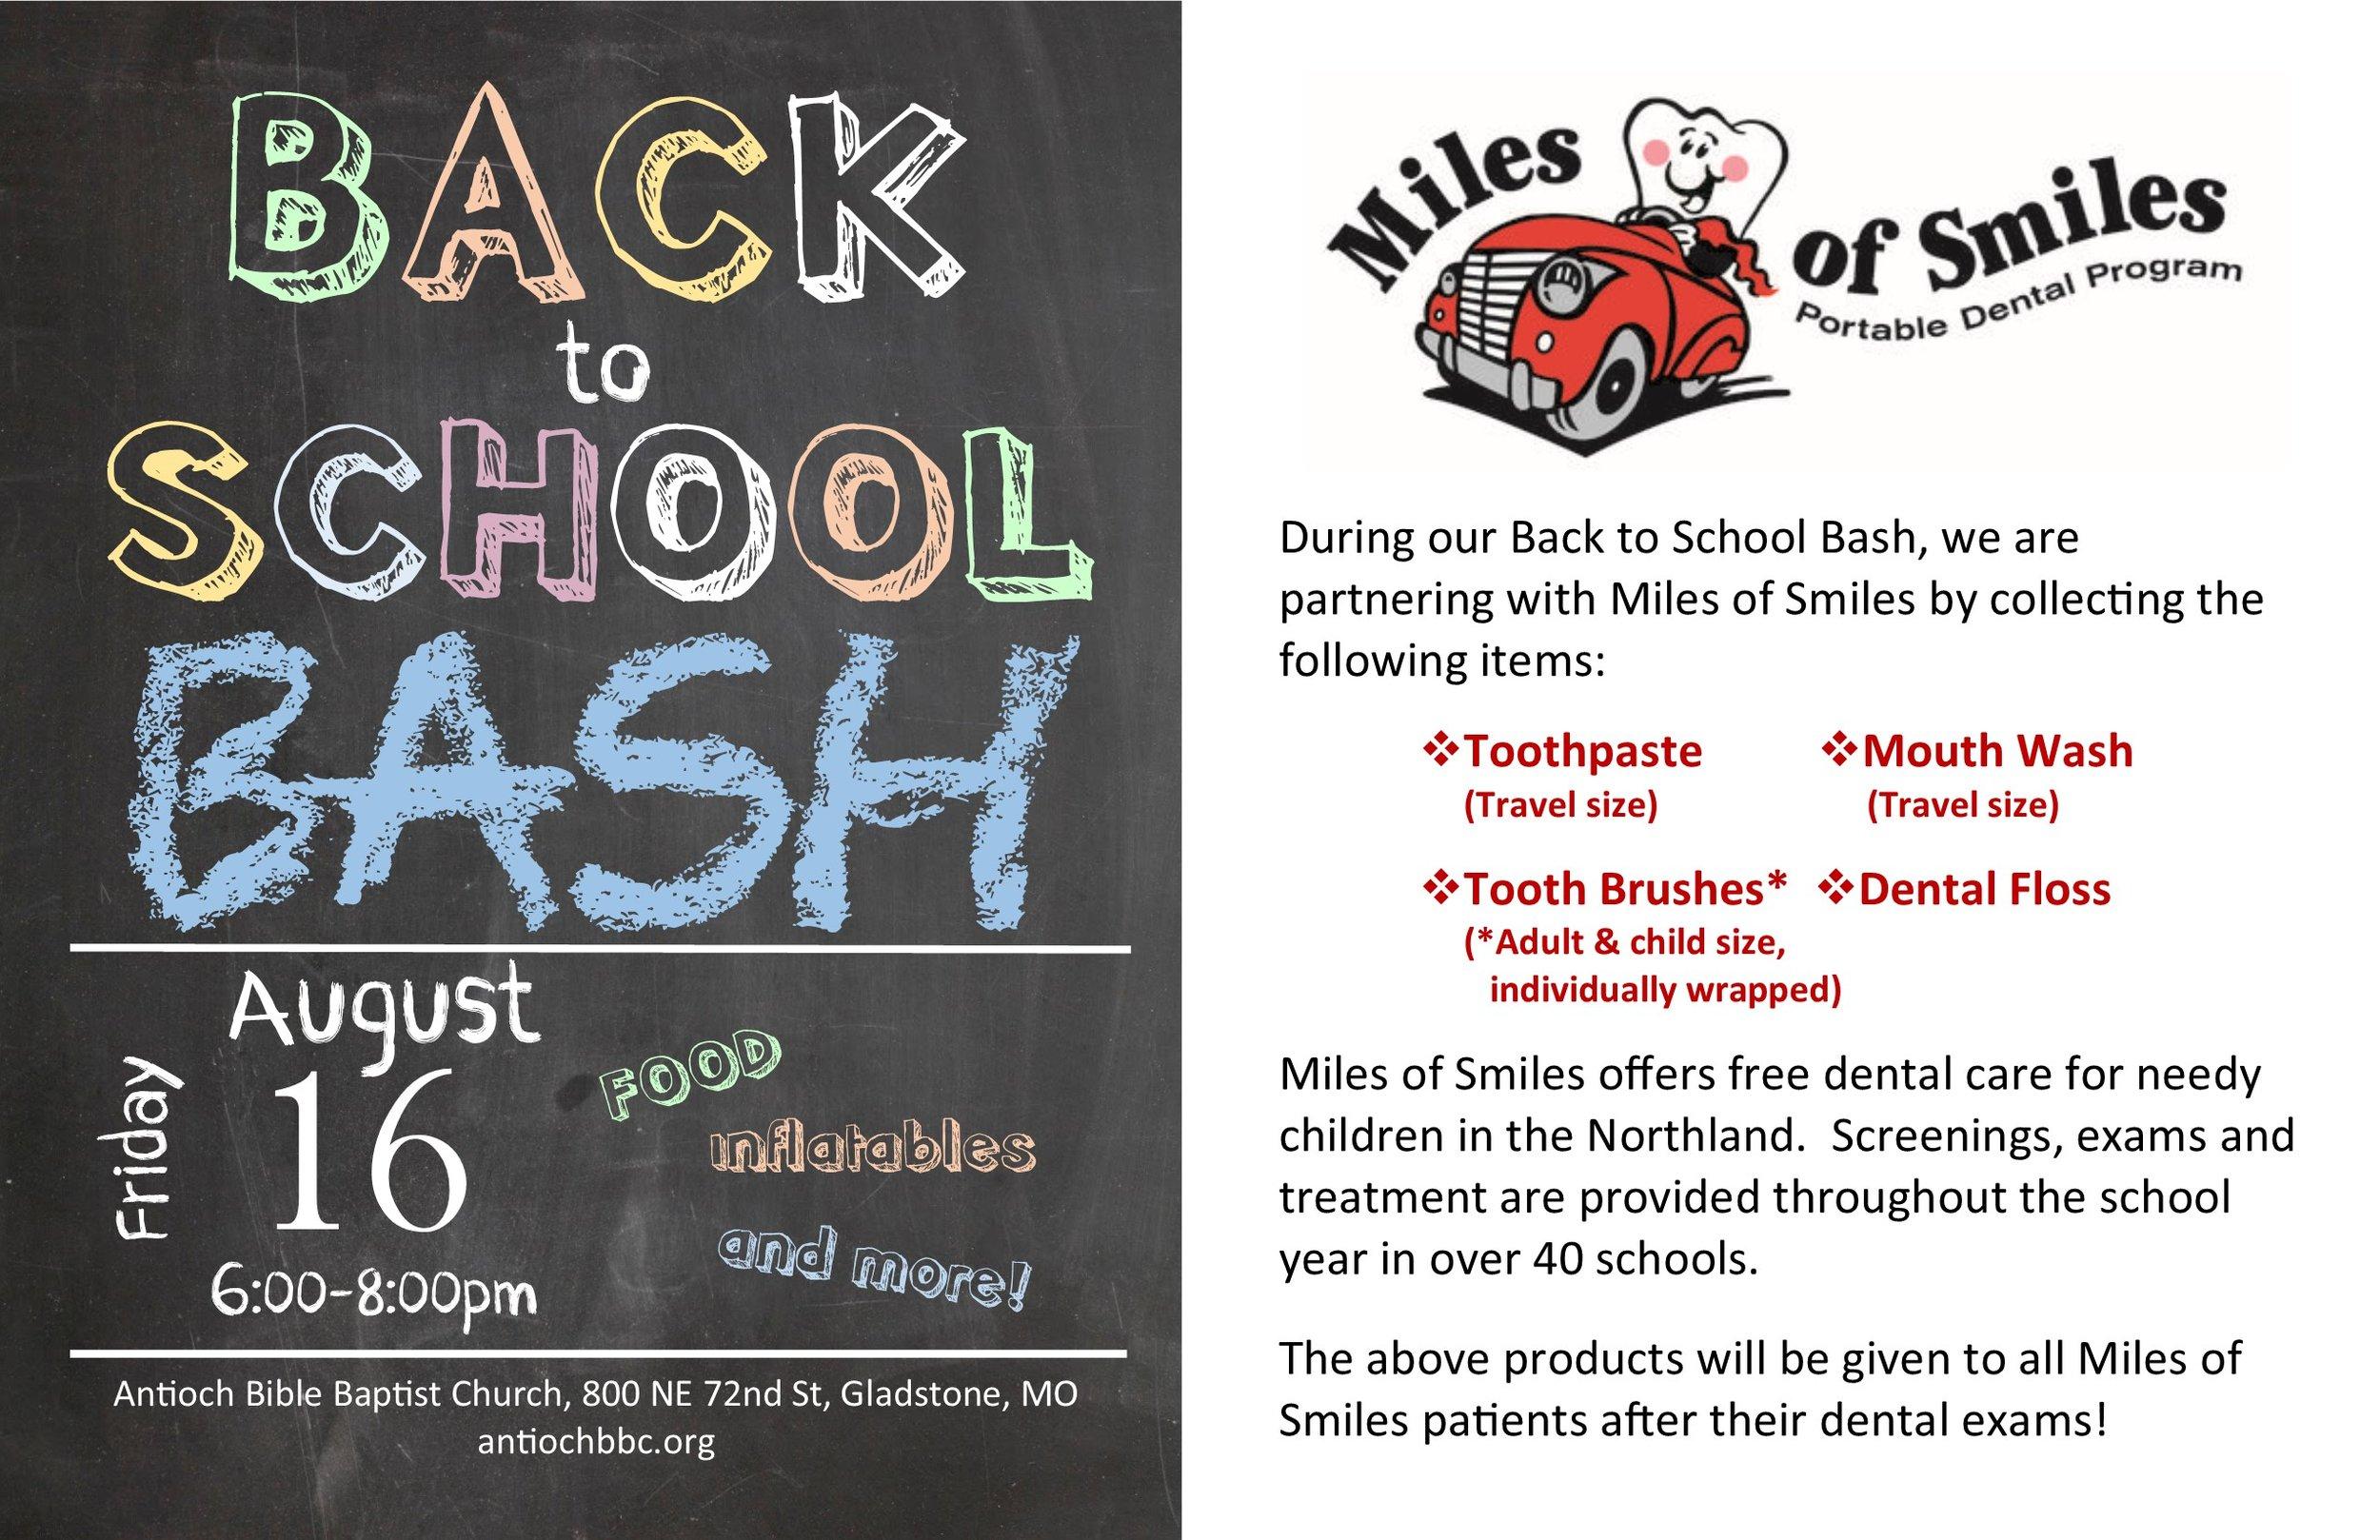 2019 Back to School Bash flyer.jpg